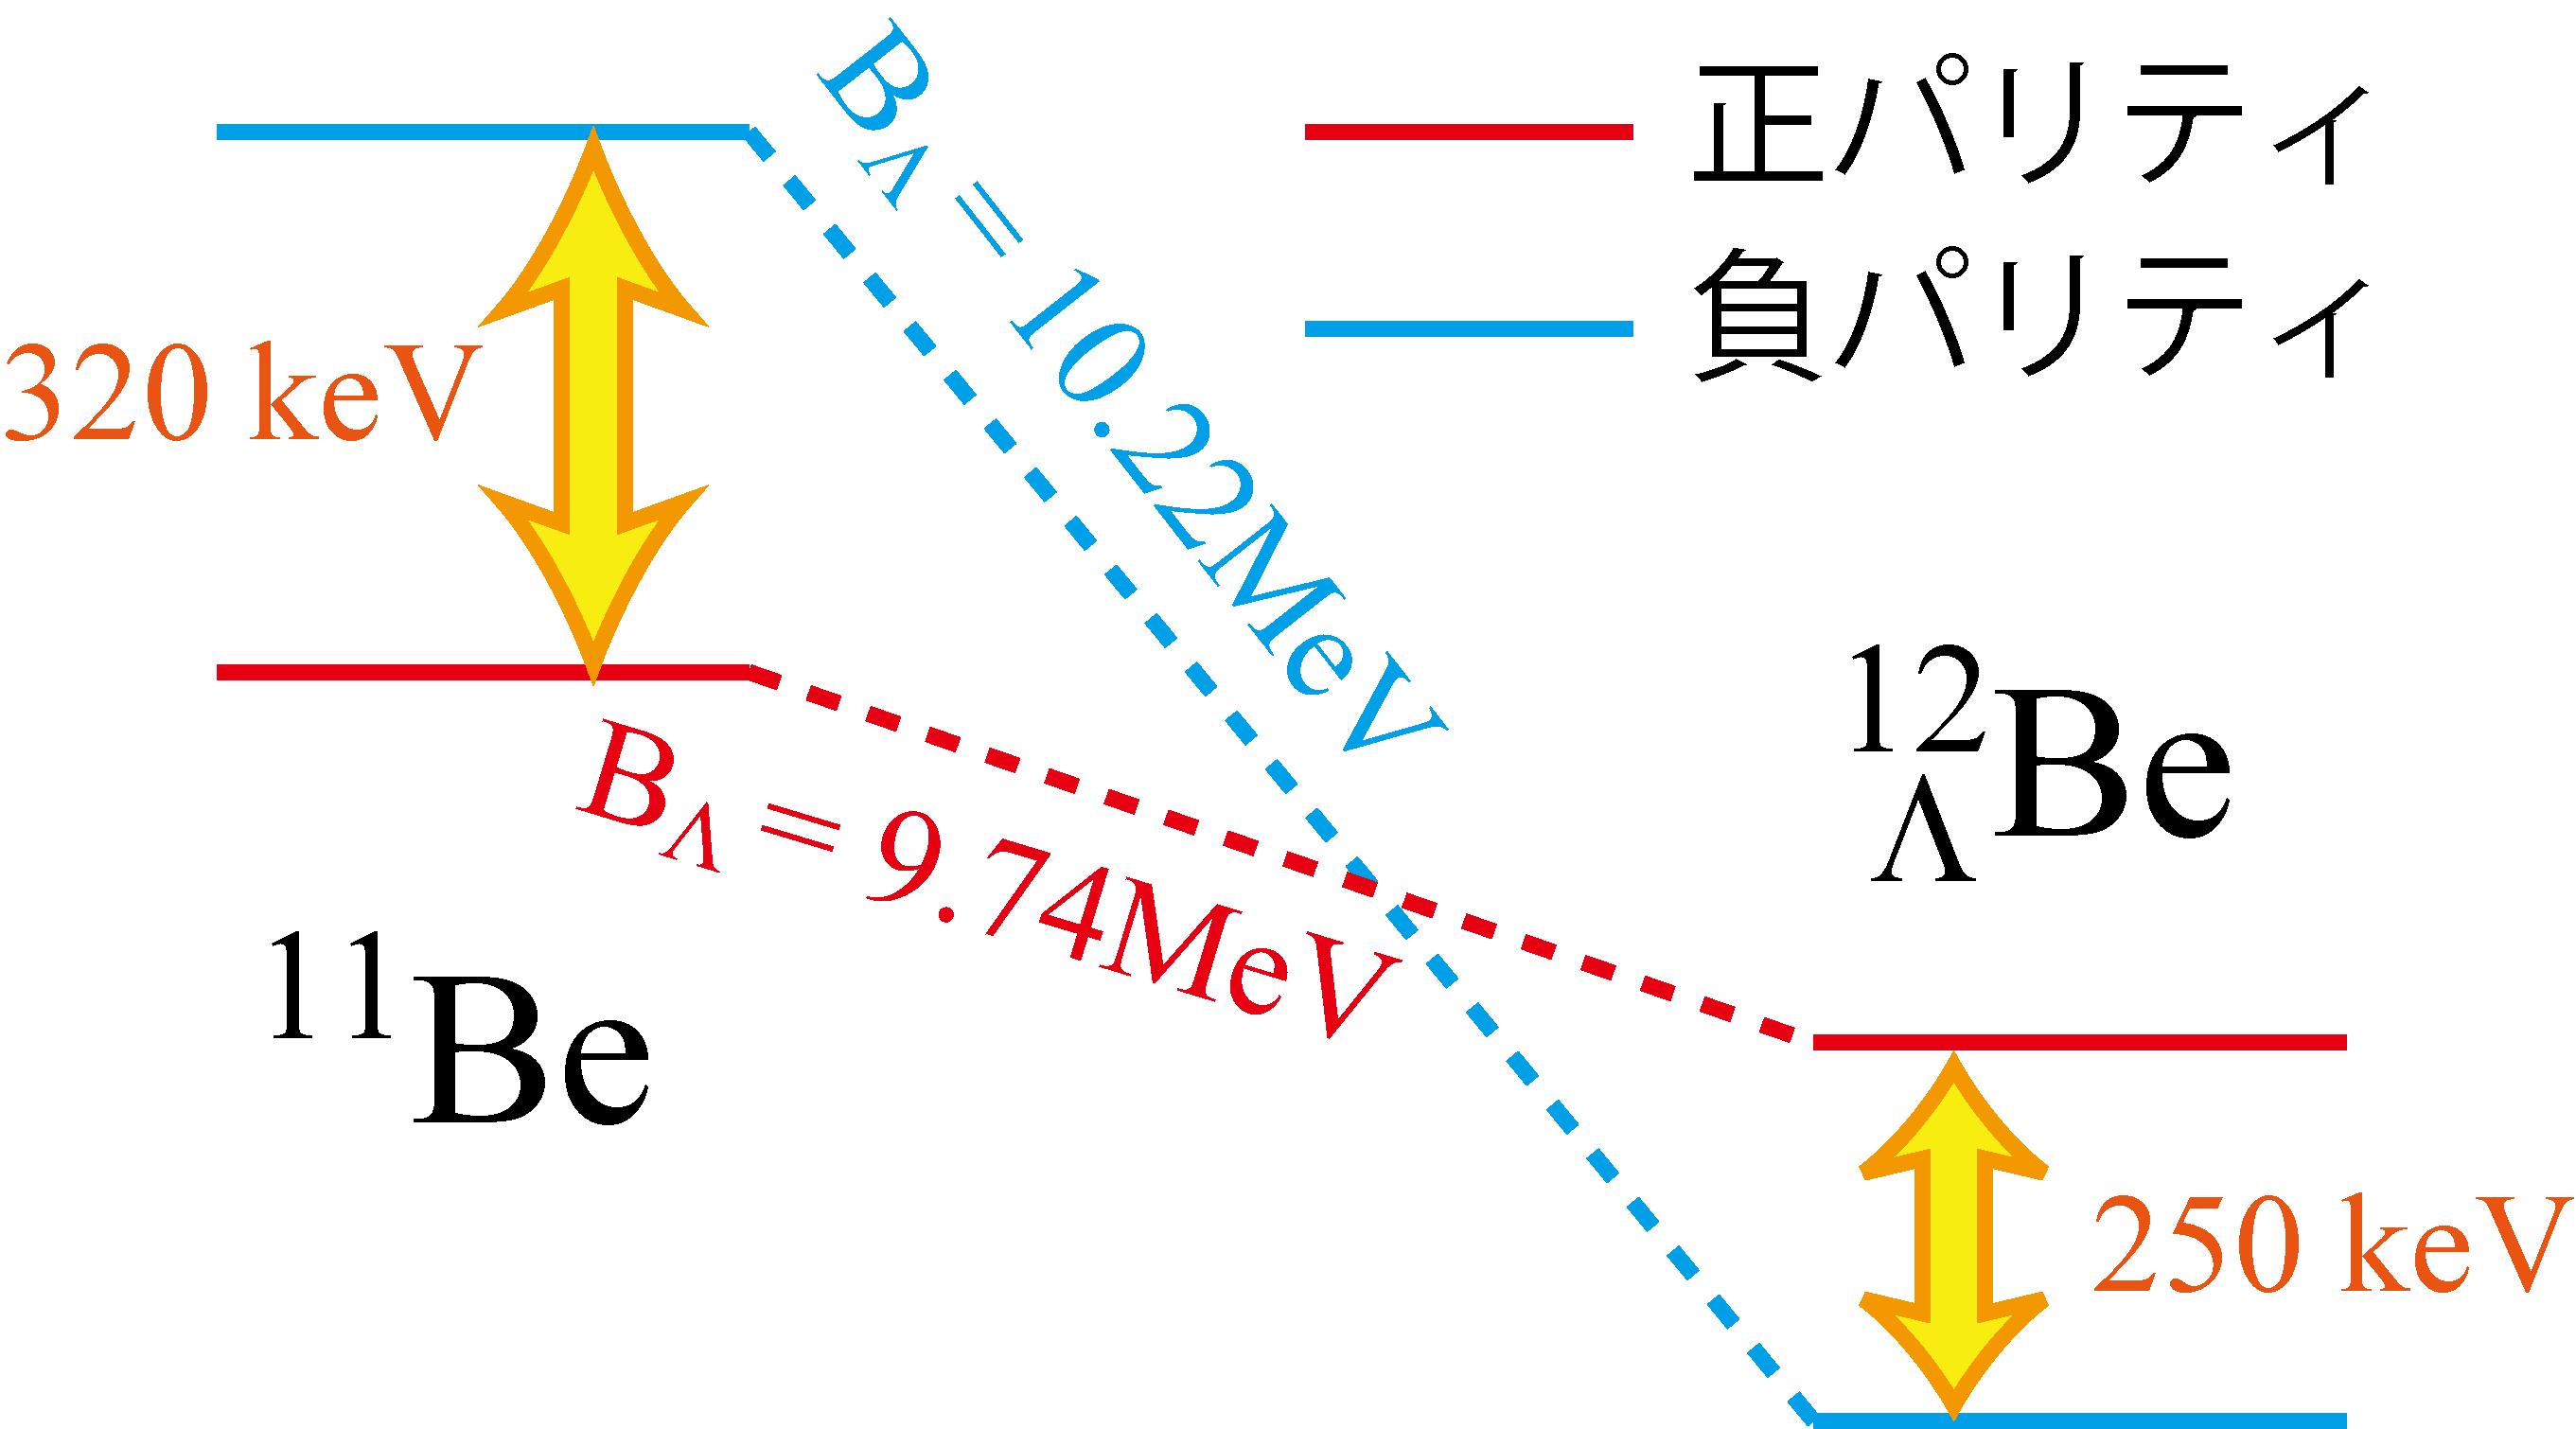 study-image-2